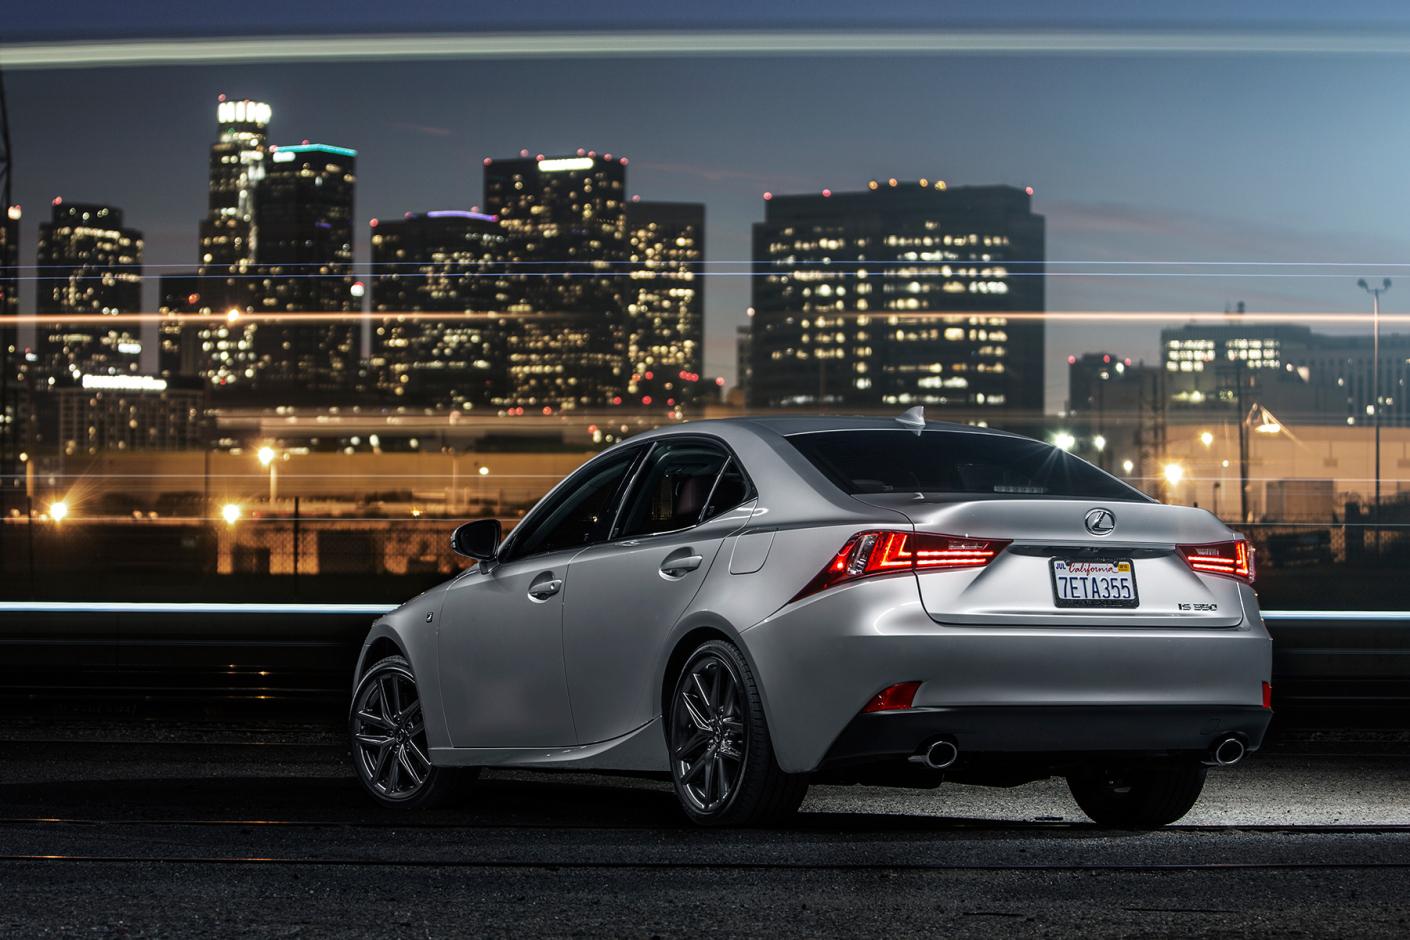 a-closer-look-the-2015-lexus-is350-f-sport-5